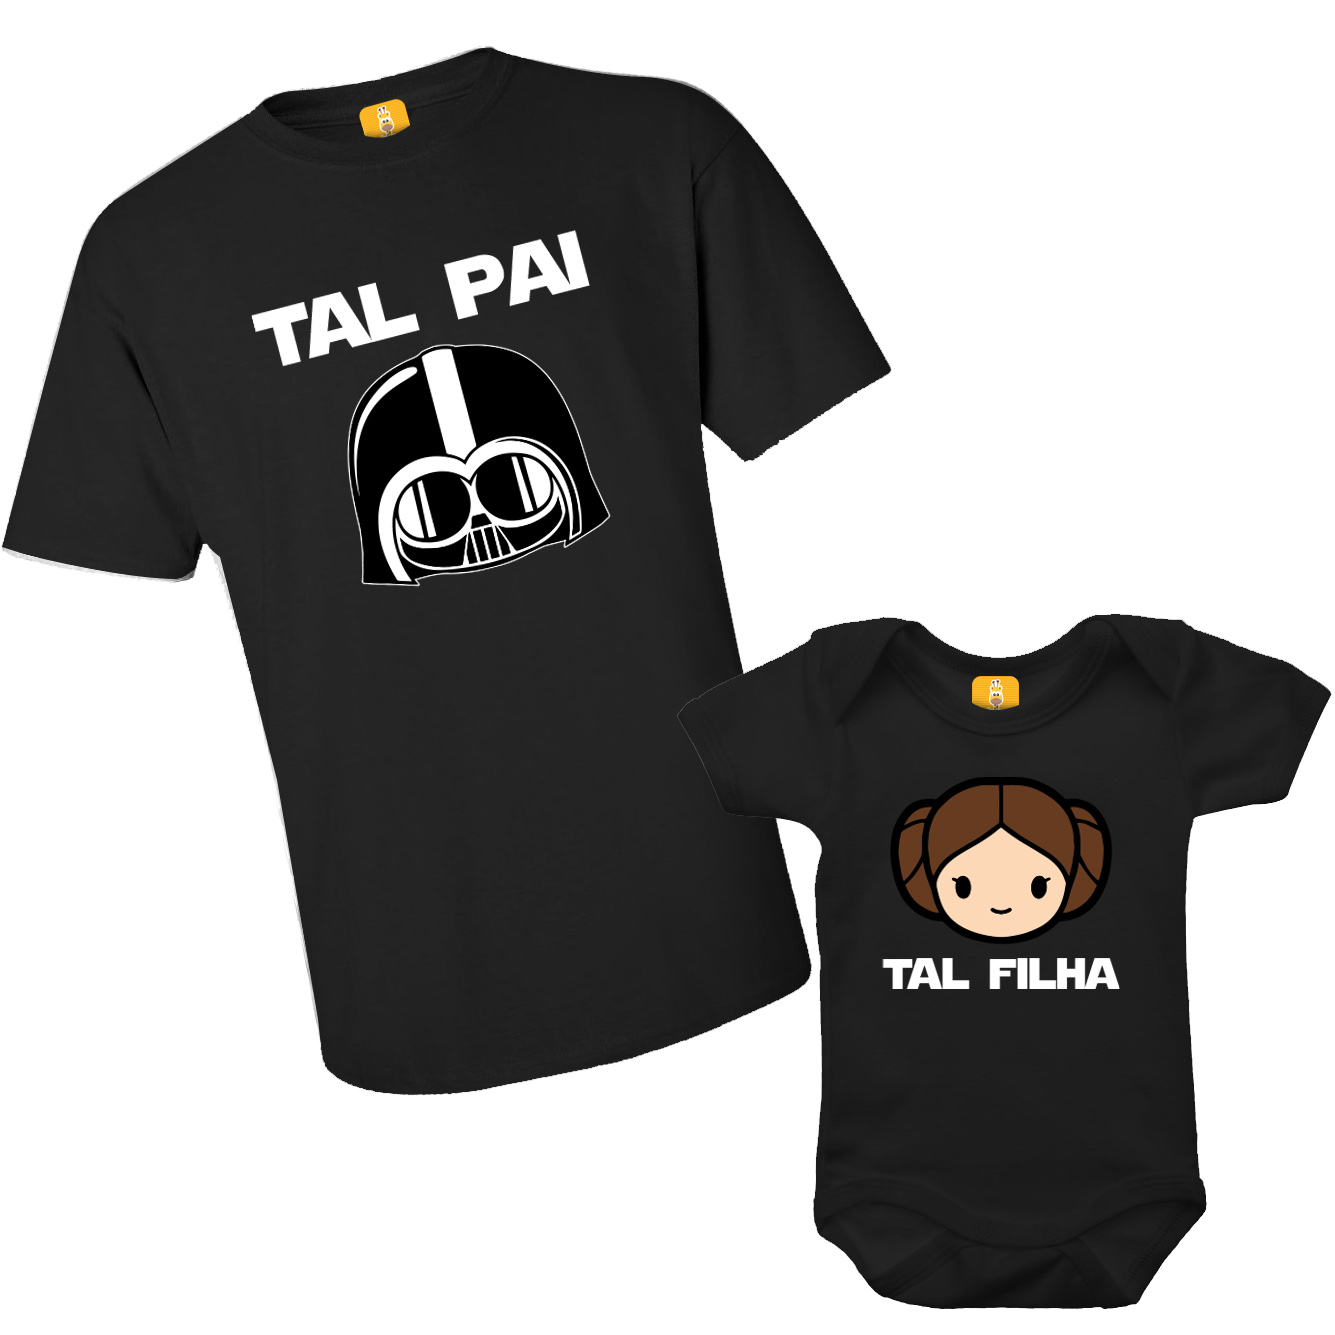 Kit Camiseta e Body Tal Pai Tal Filha - Darth Vader e Princesa Leia - Star Wars